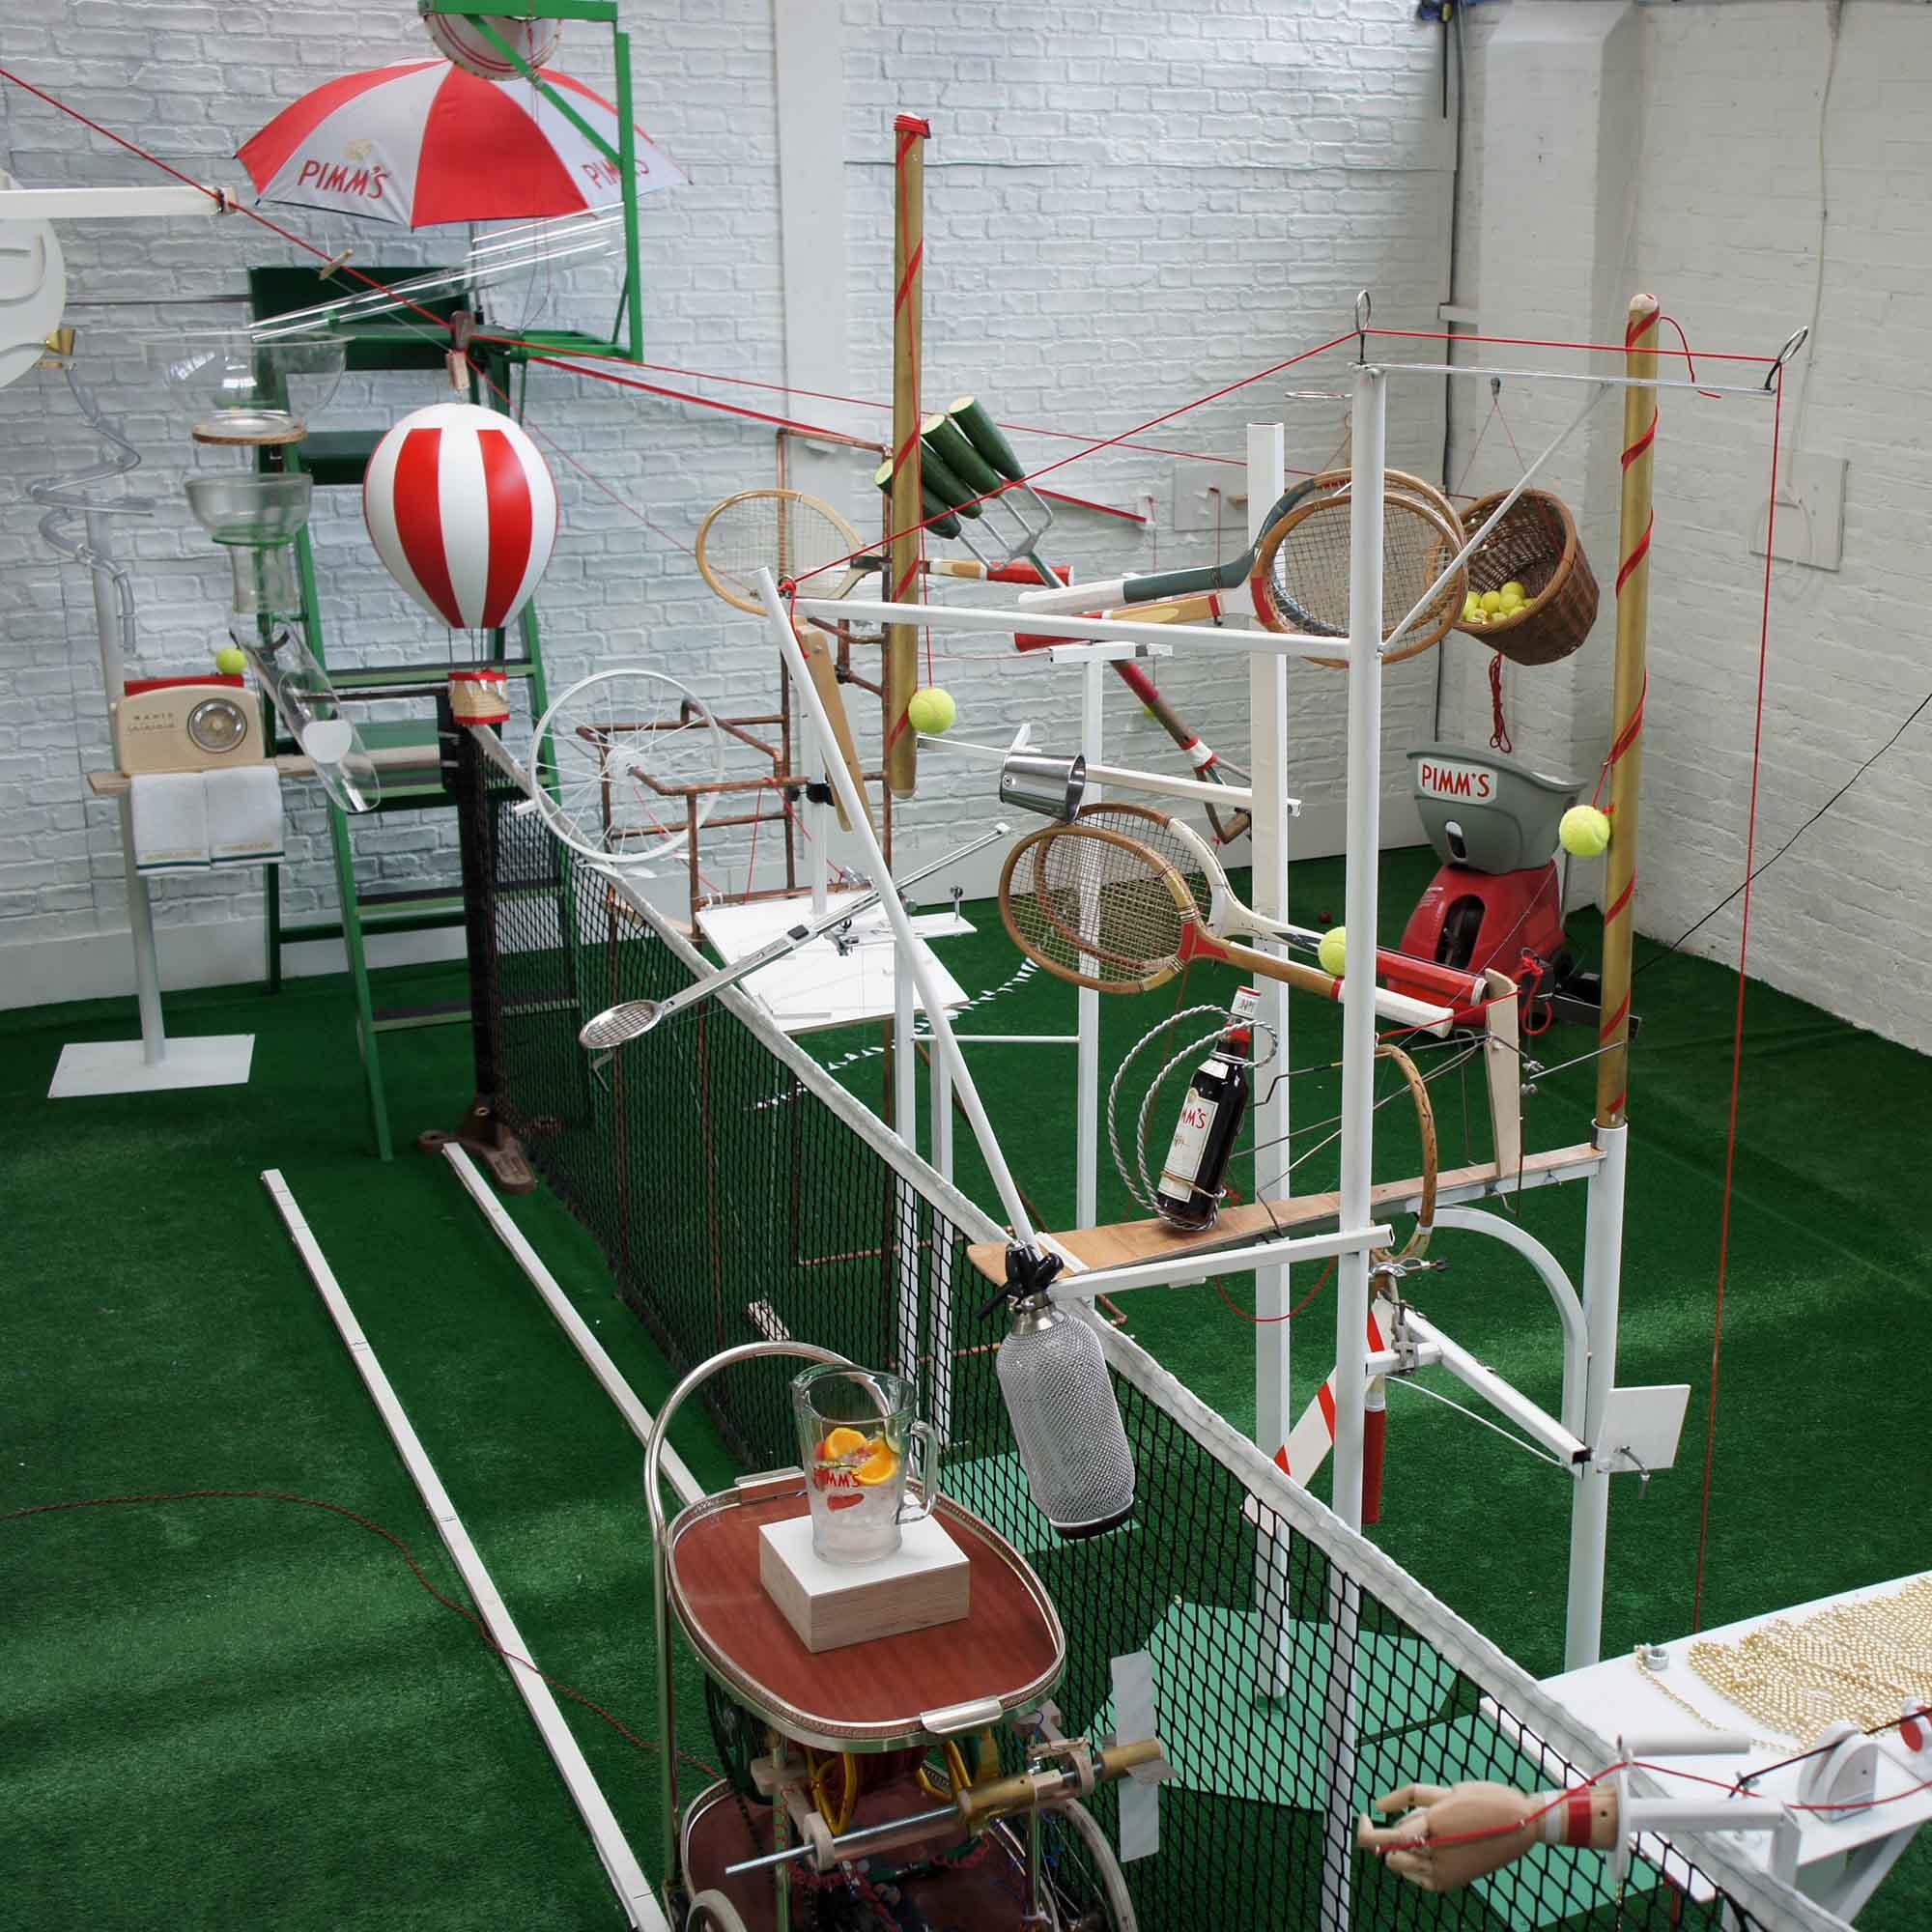 Rube Goldberg Machine for Pimms